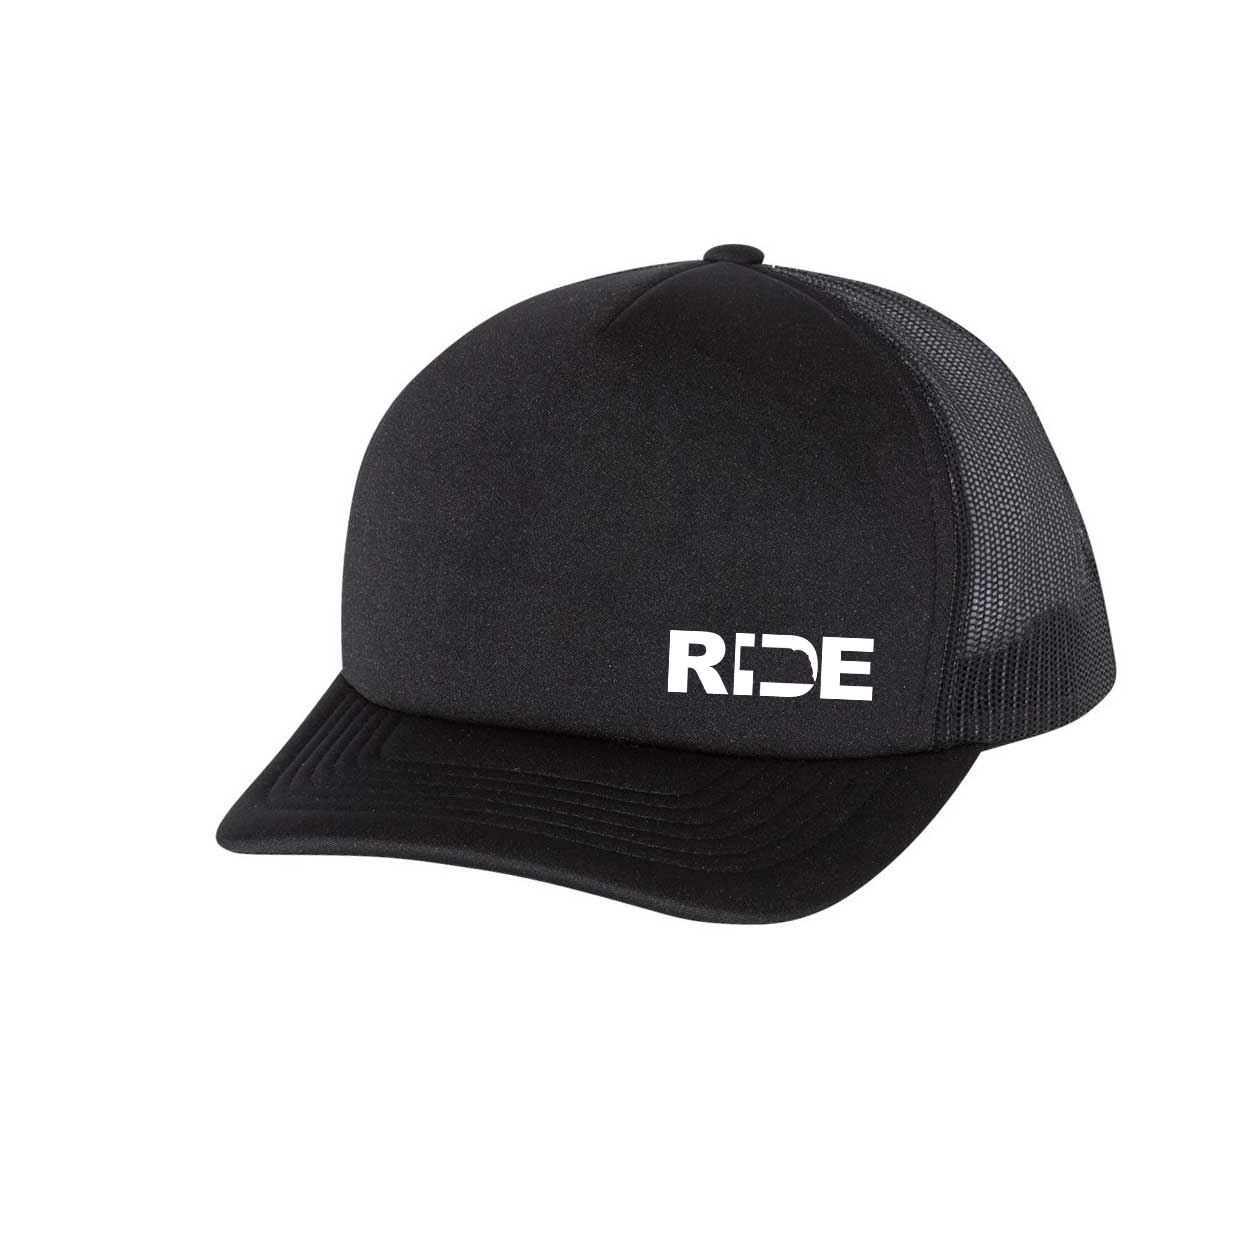 Ride Nebraska Night Out Premium Foam Trucker Snapback Hat Black (White Logo)